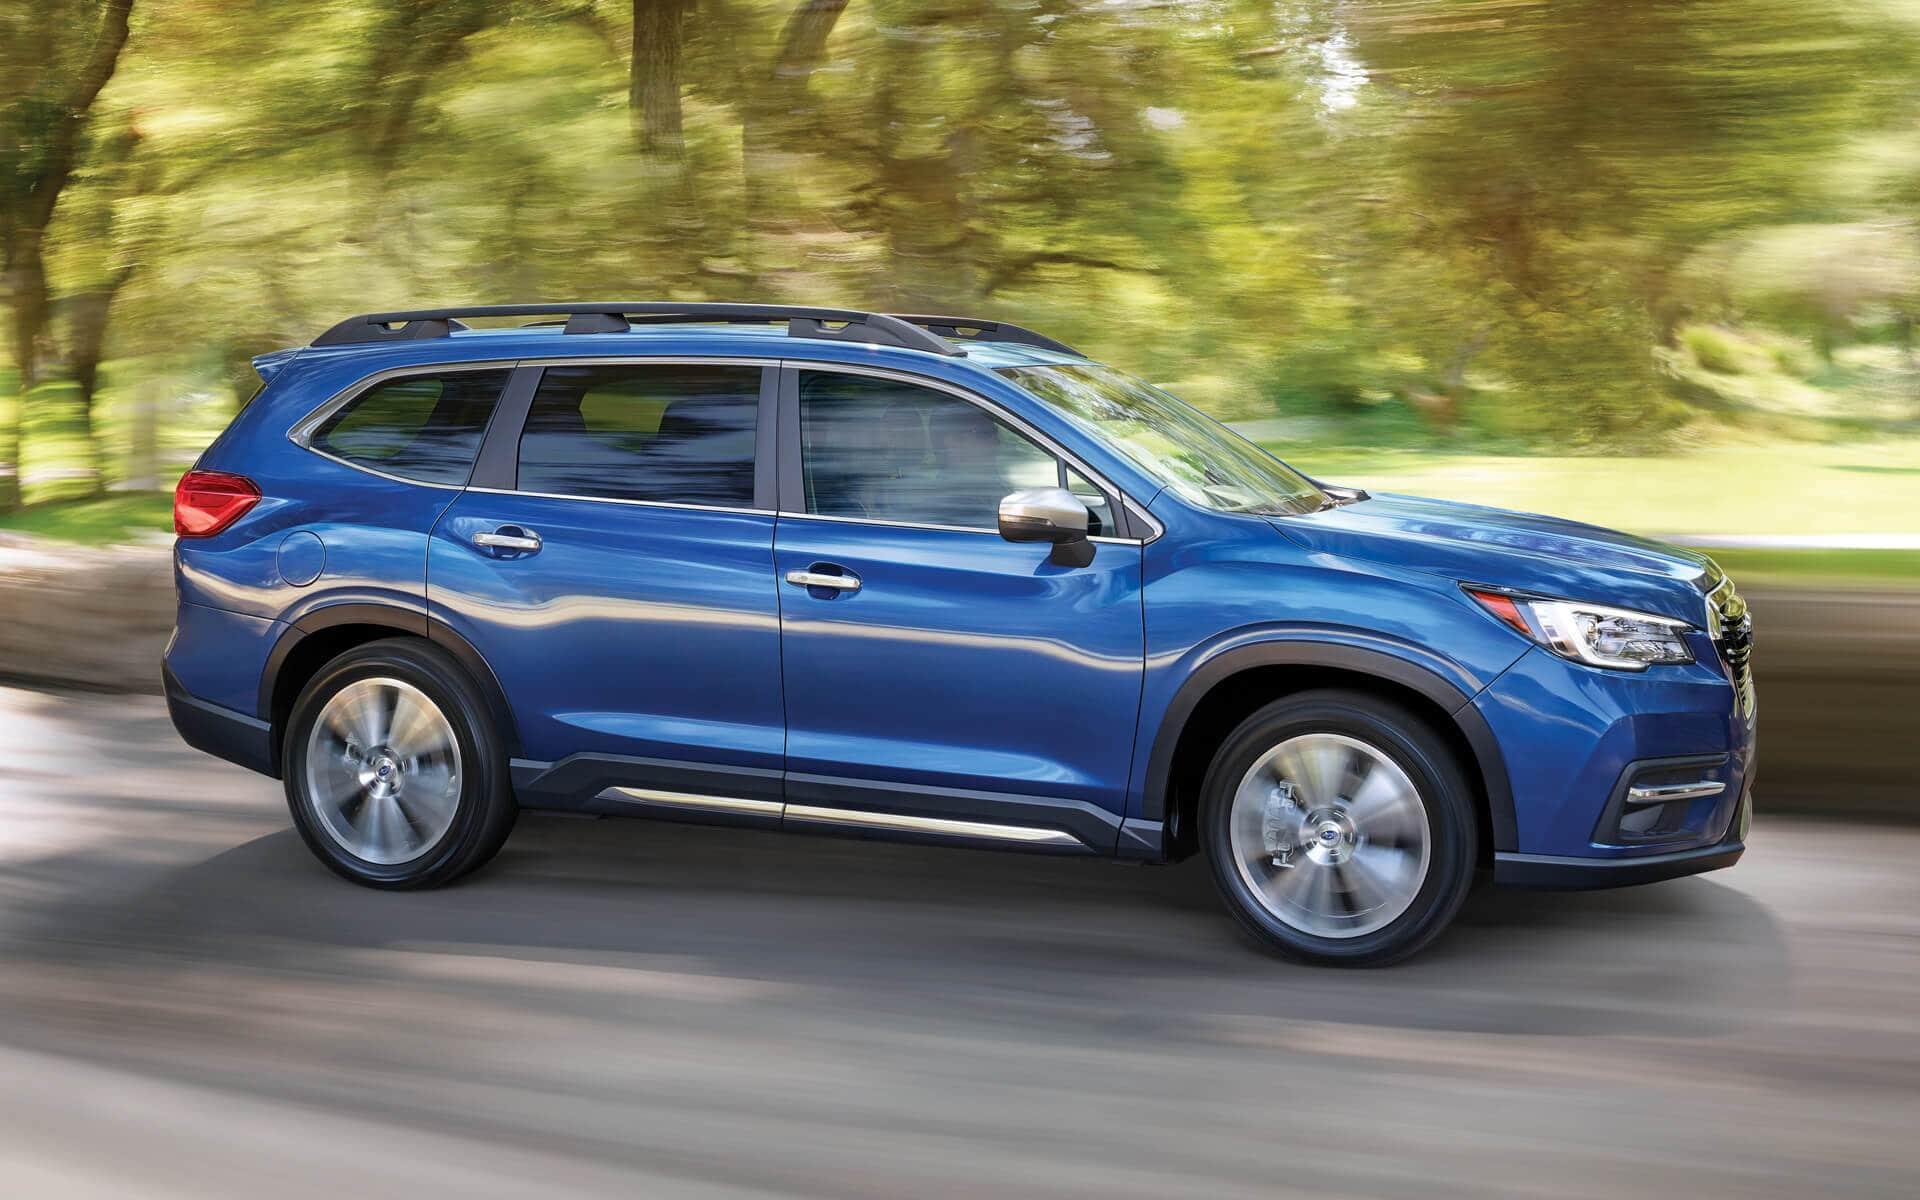 22 All New Subaru Eyesight 2020 Performance with Subaru Eyesight 2020